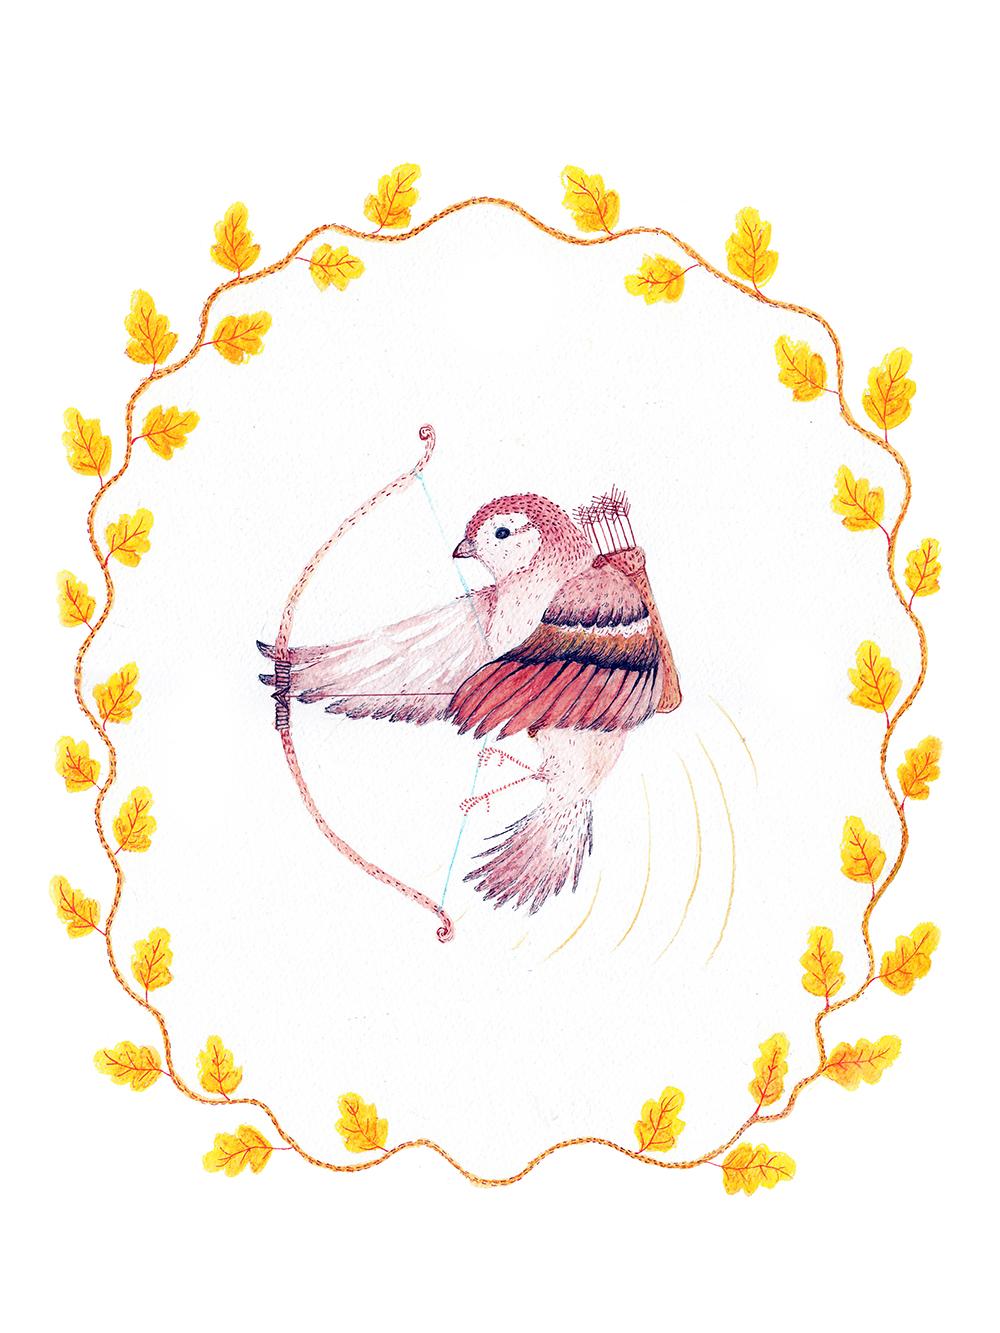 """Sparrow"" by Jennifer Muir"